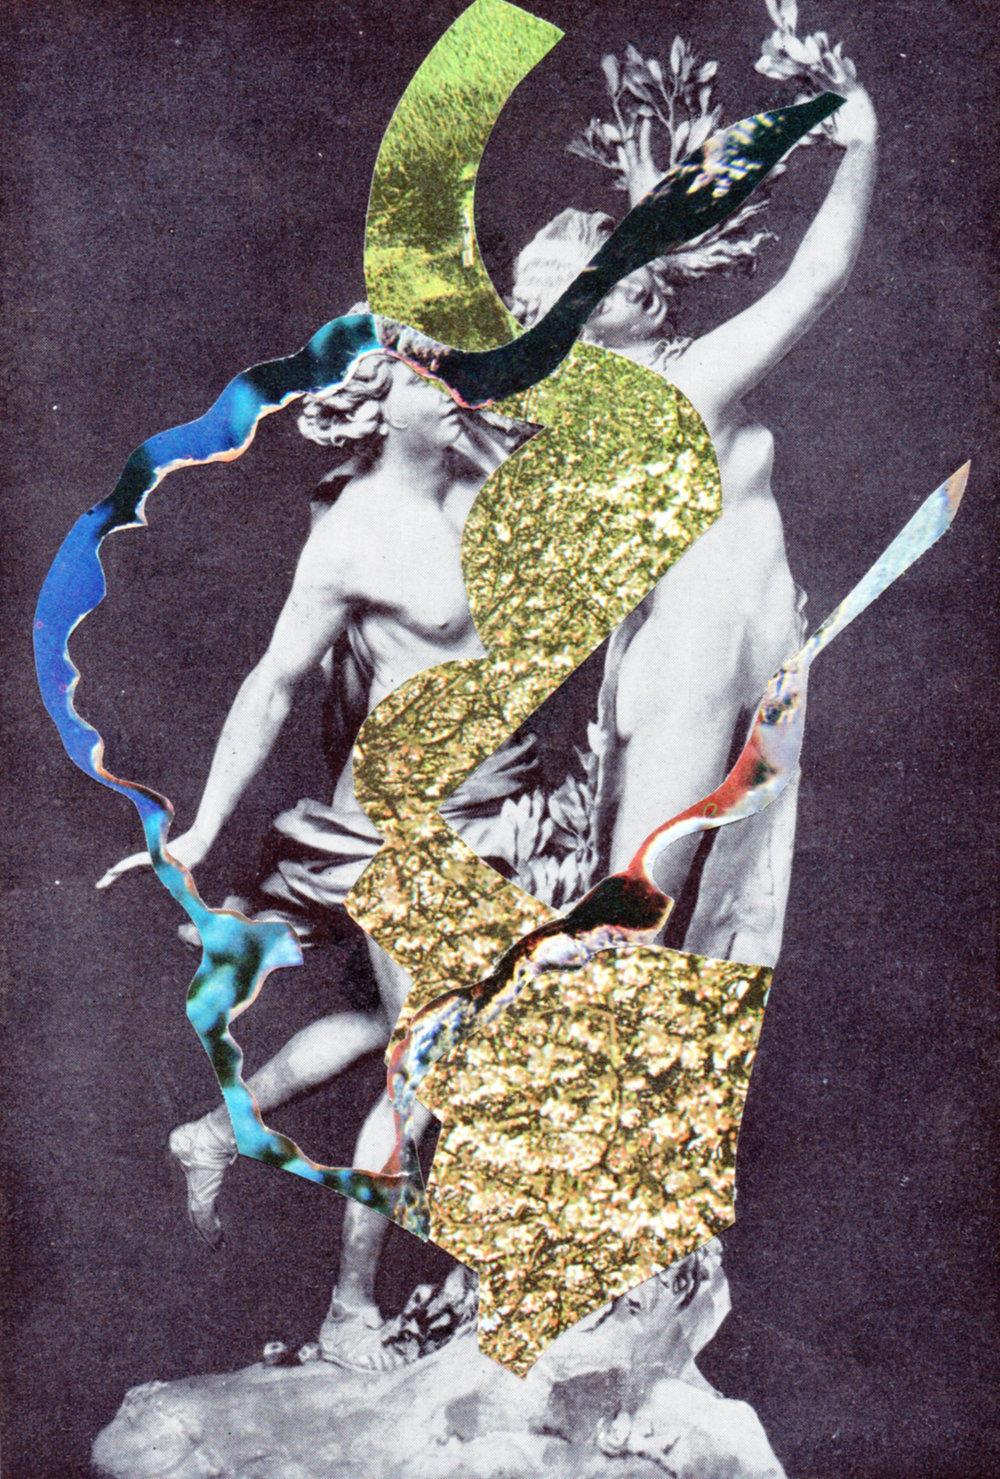 Untitled, 2014, 13 x 18 cm